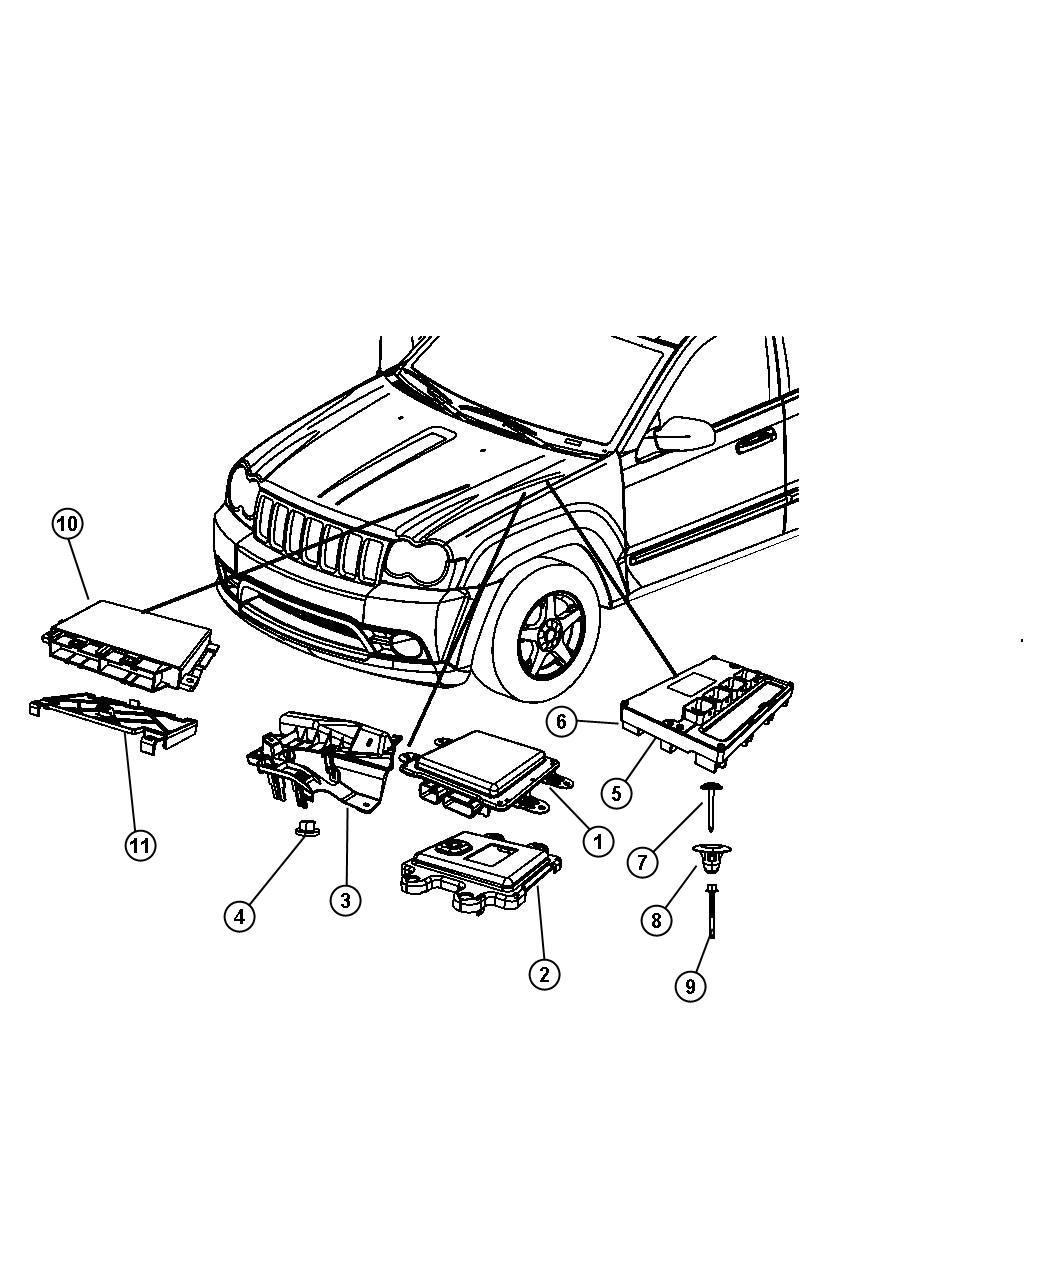 2010 Jeep Liberty Module. Transmission control